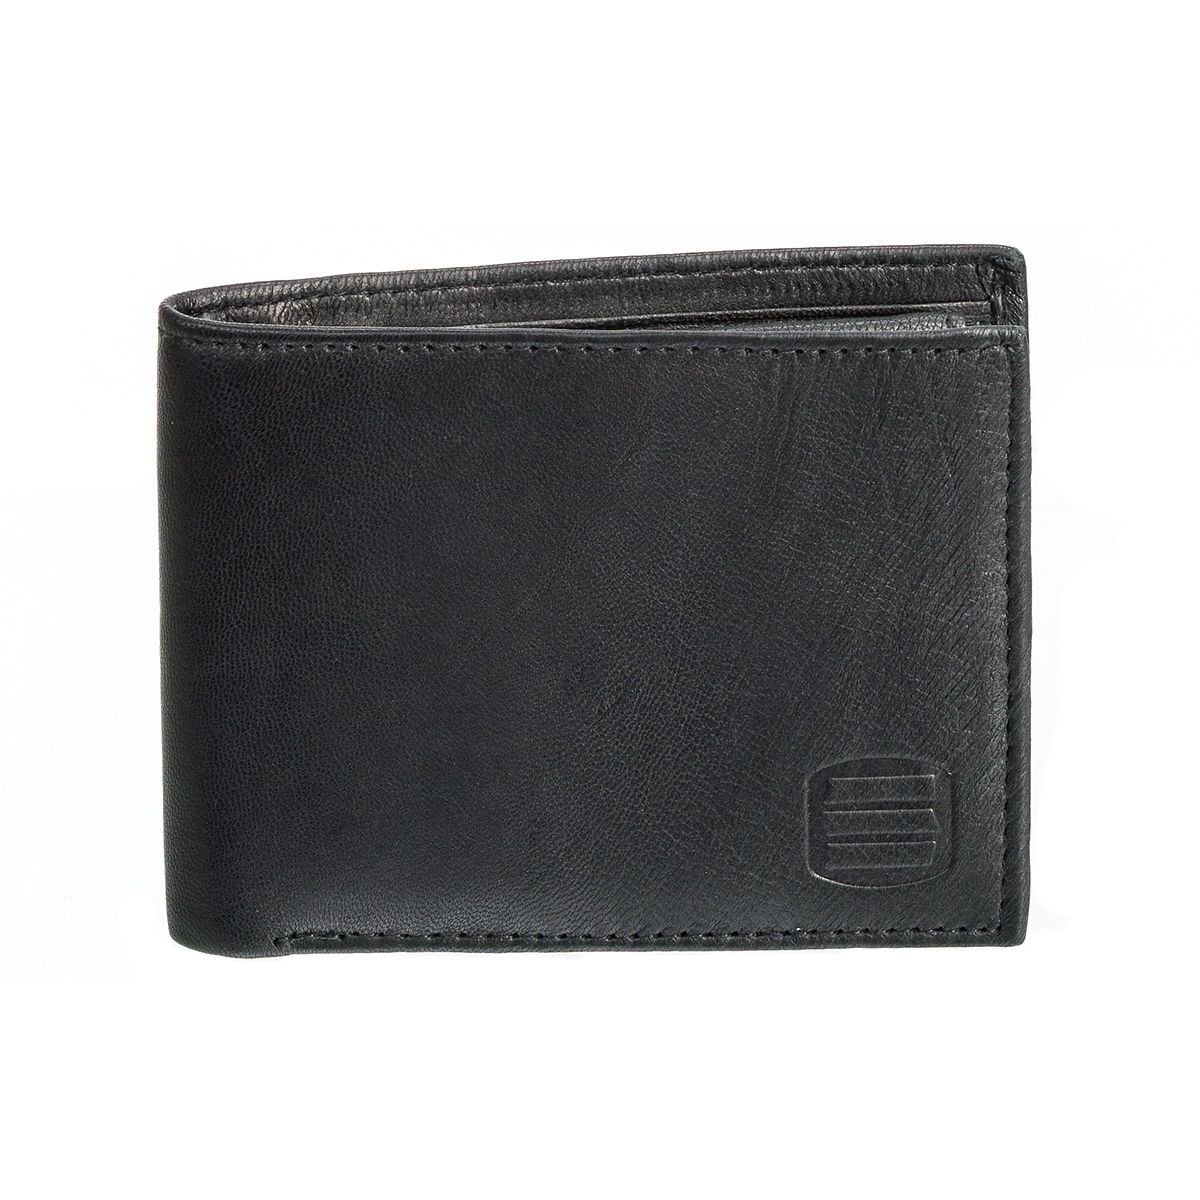 Suvelle Men's Classic Bi-fold Wallet